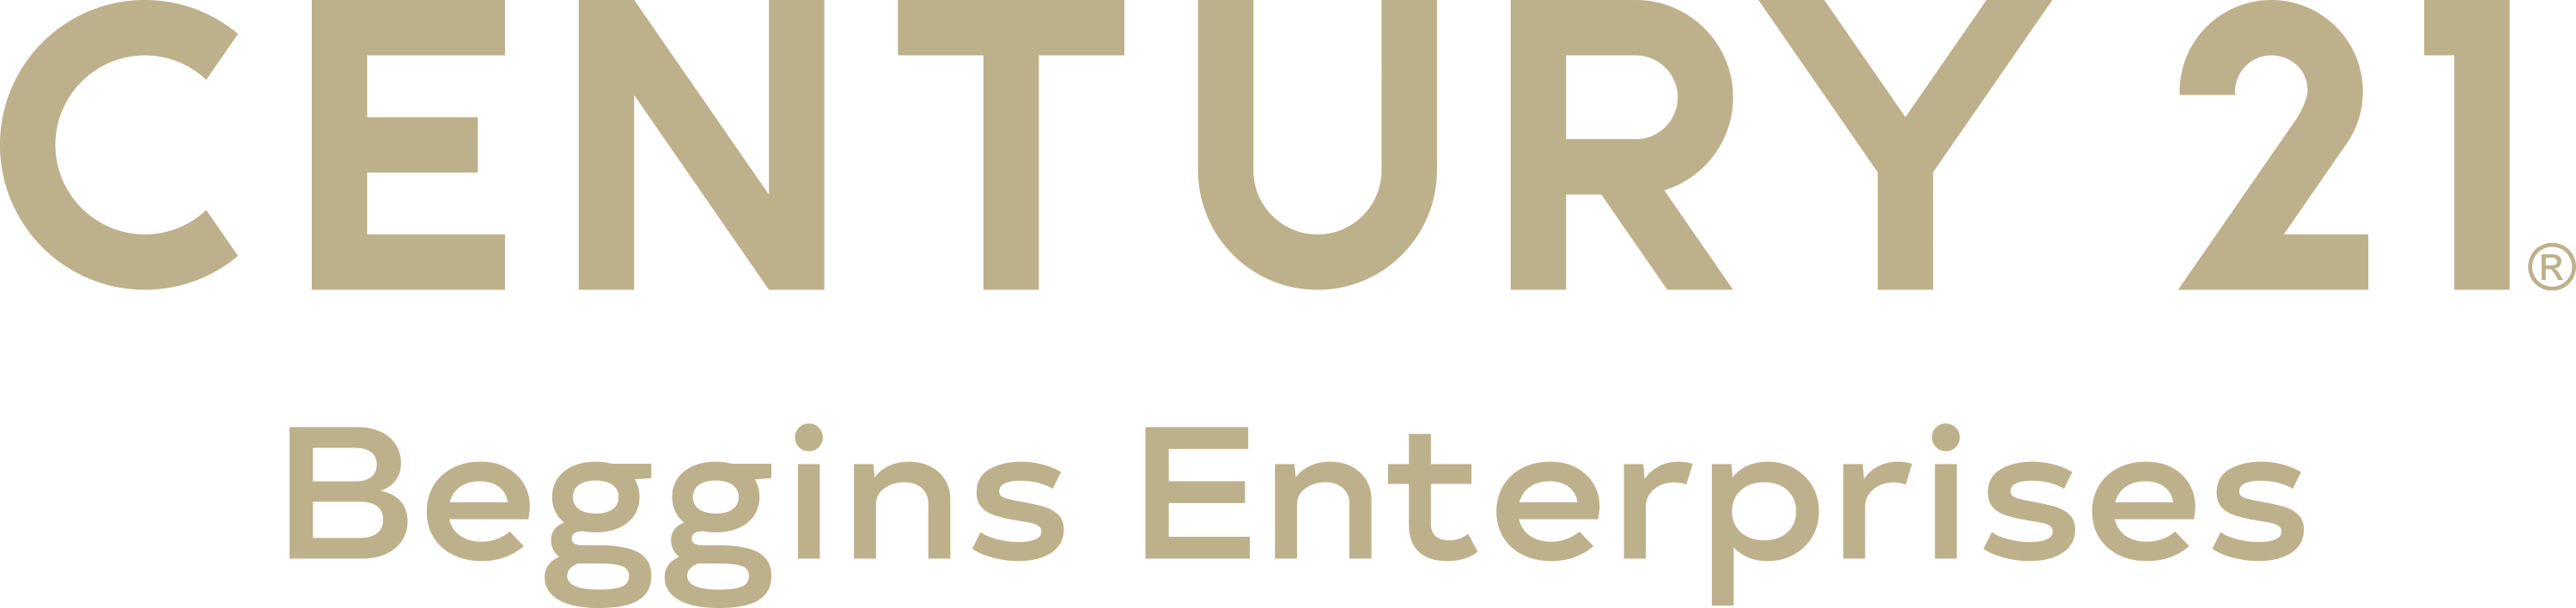 CENTURY 21 Beggins Enterprises Company Logo